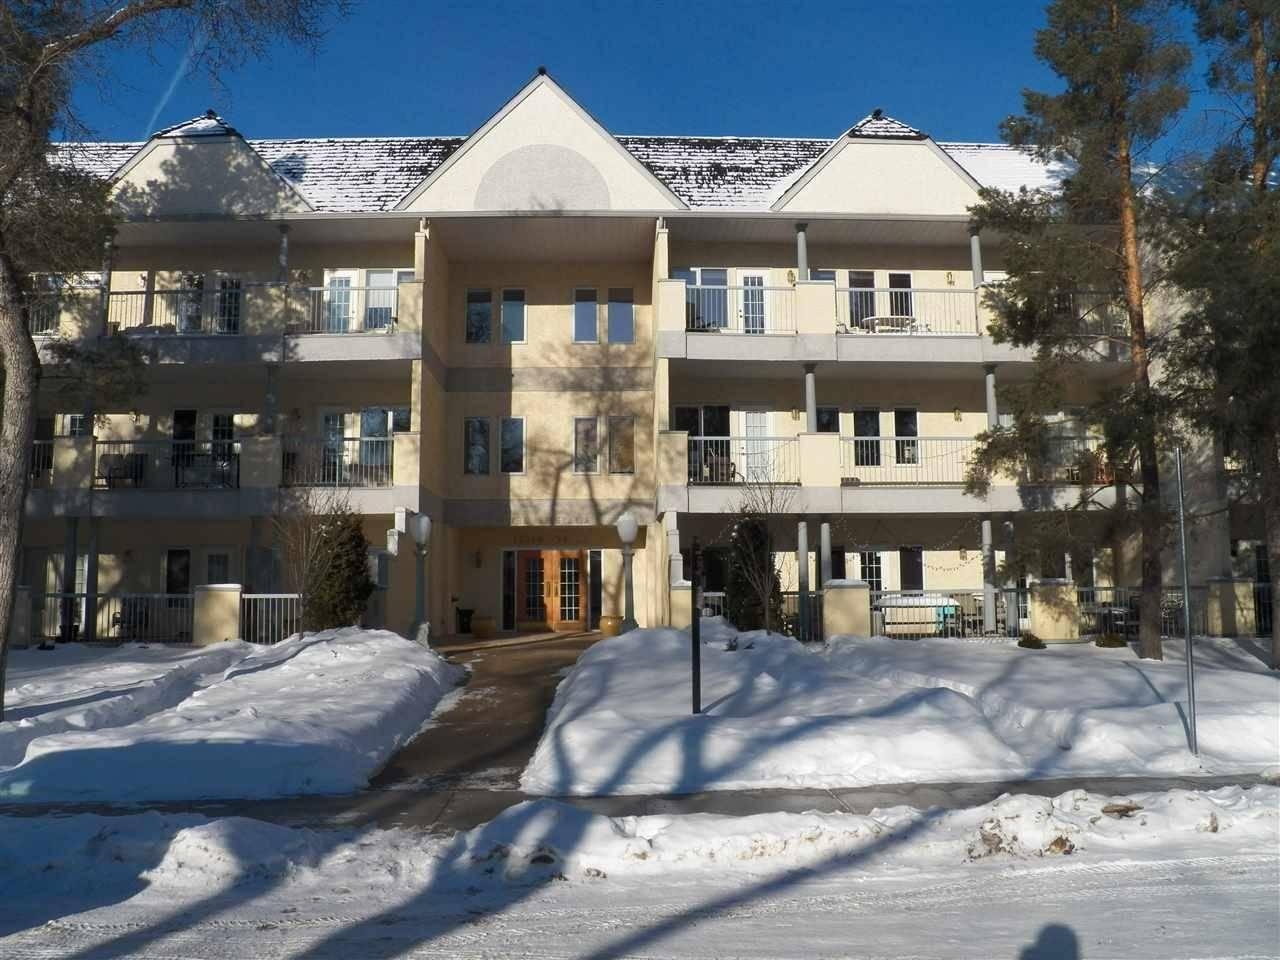 Buliding: 11660 79 Avenue Northwest, Edmonton, AB